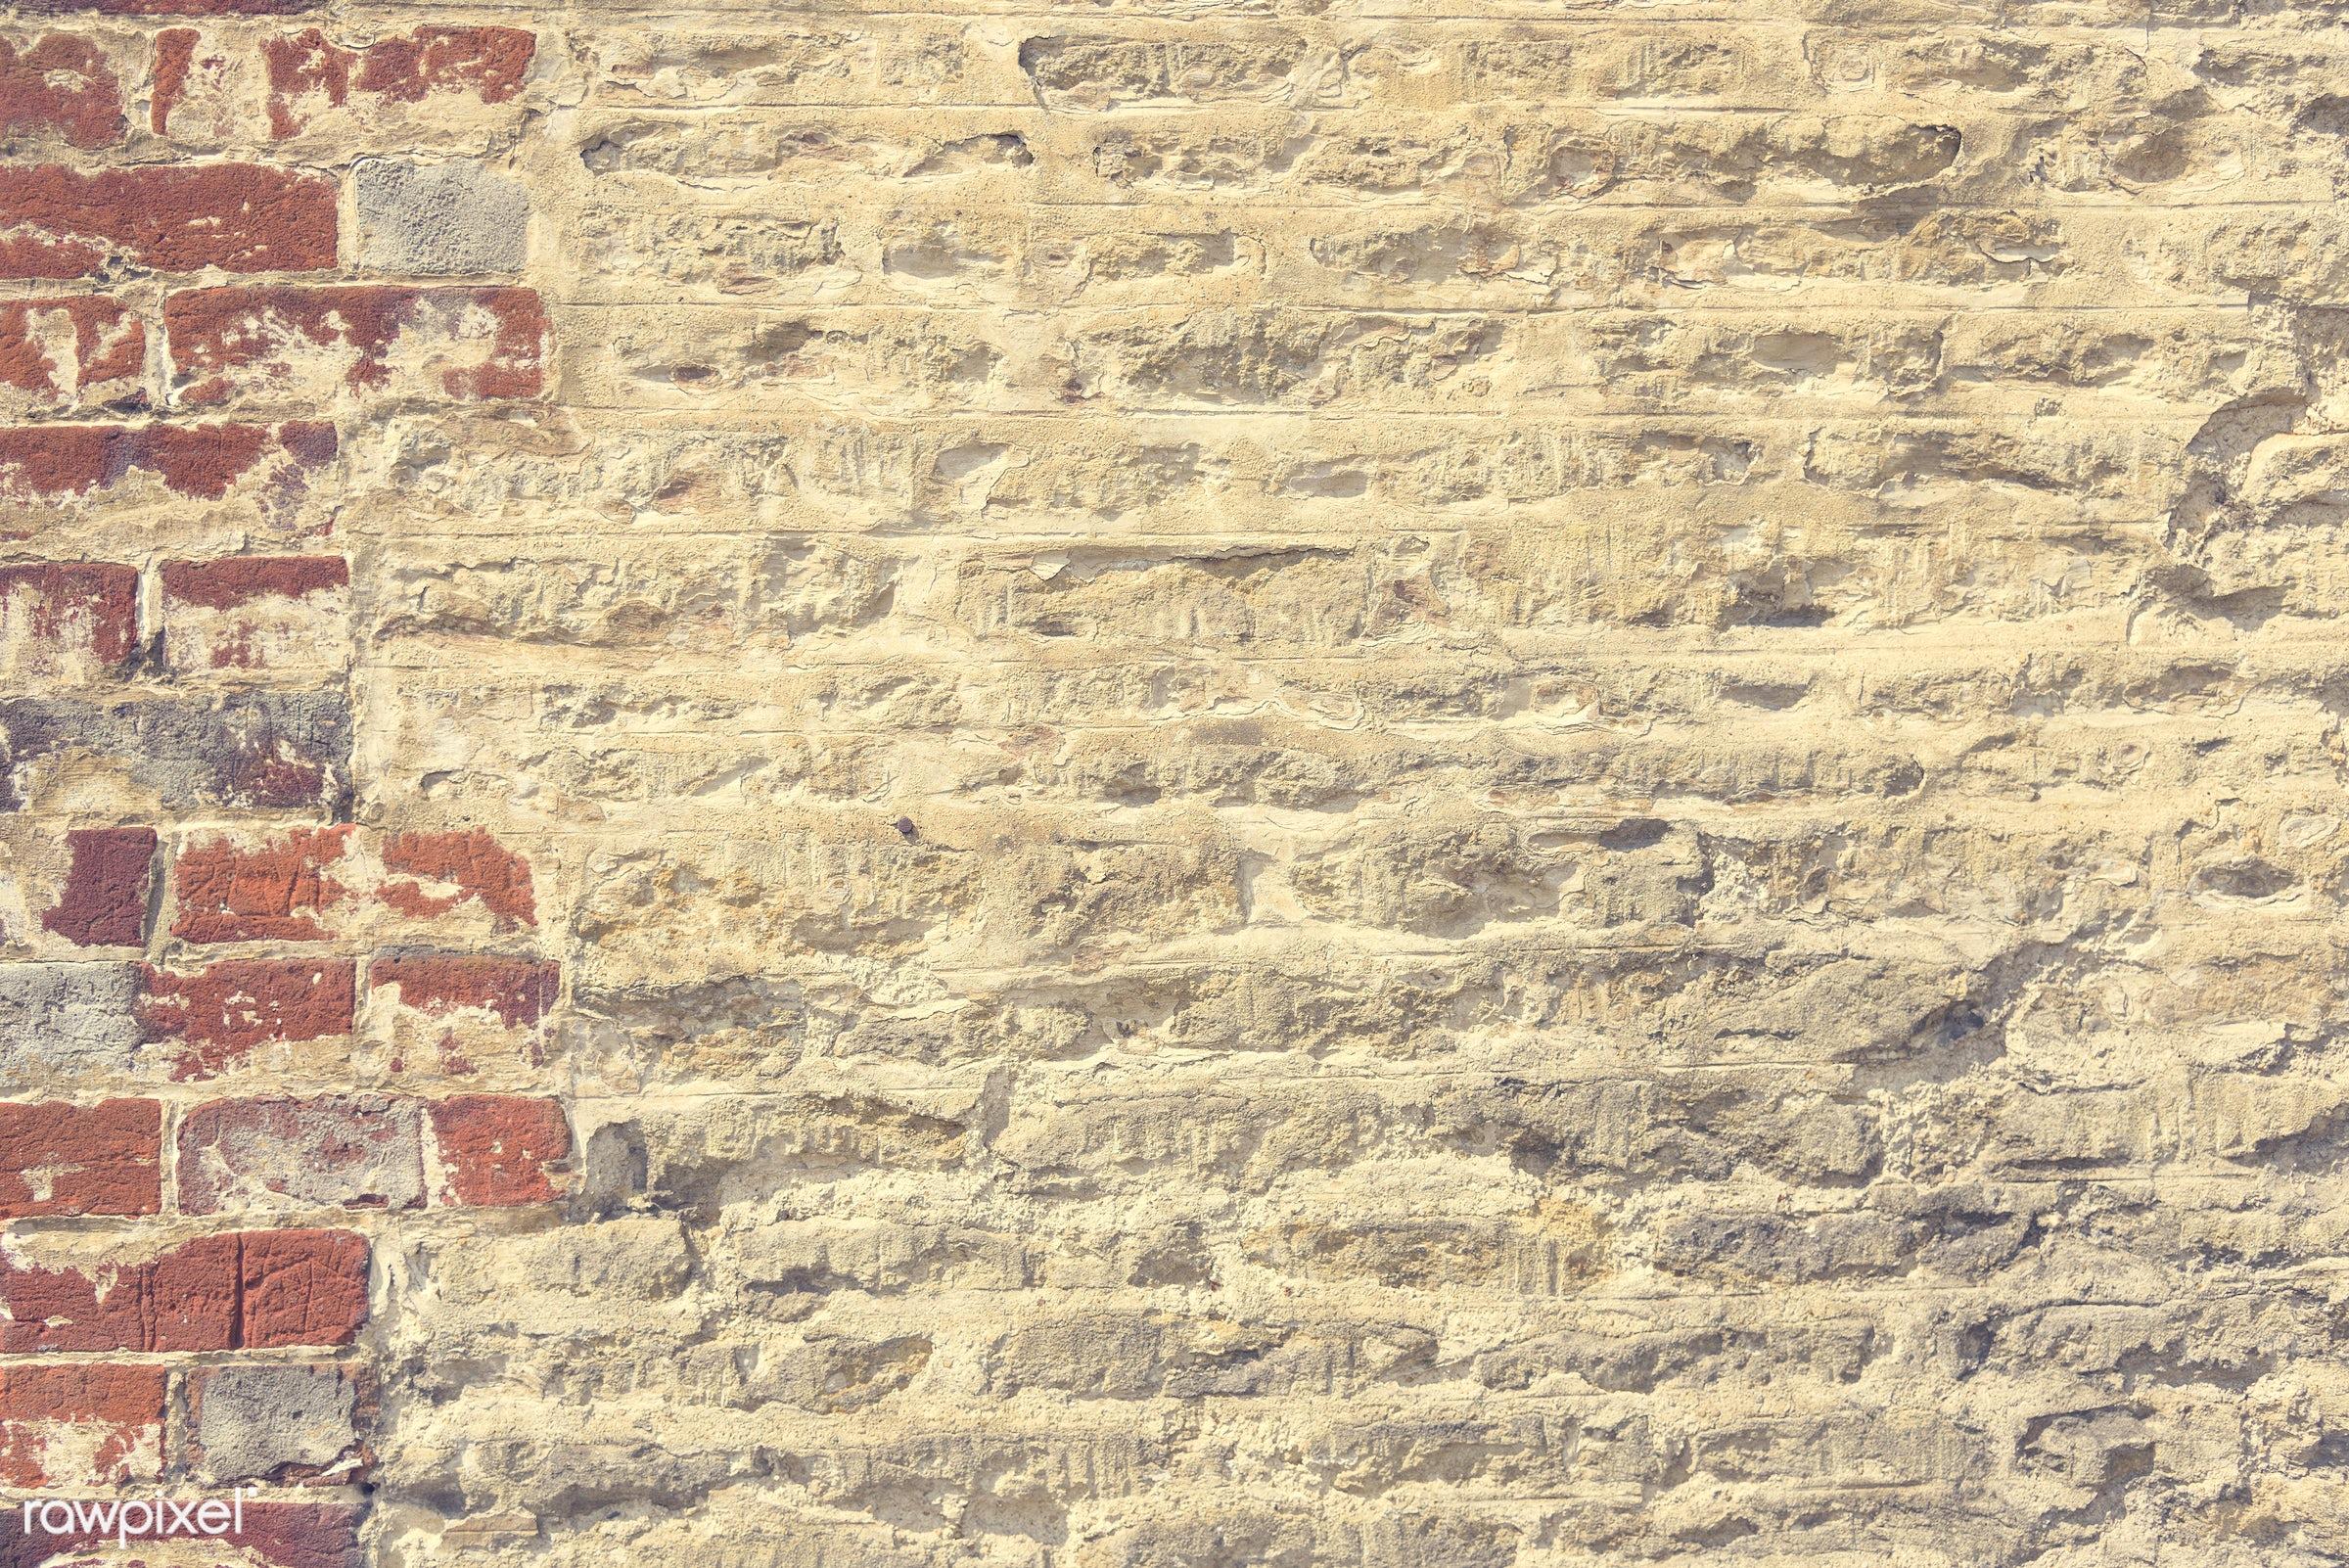 aged, aging, antique, architectural, architecture, background, blanket, block, brick, brickwall, brickwork, building, cement...